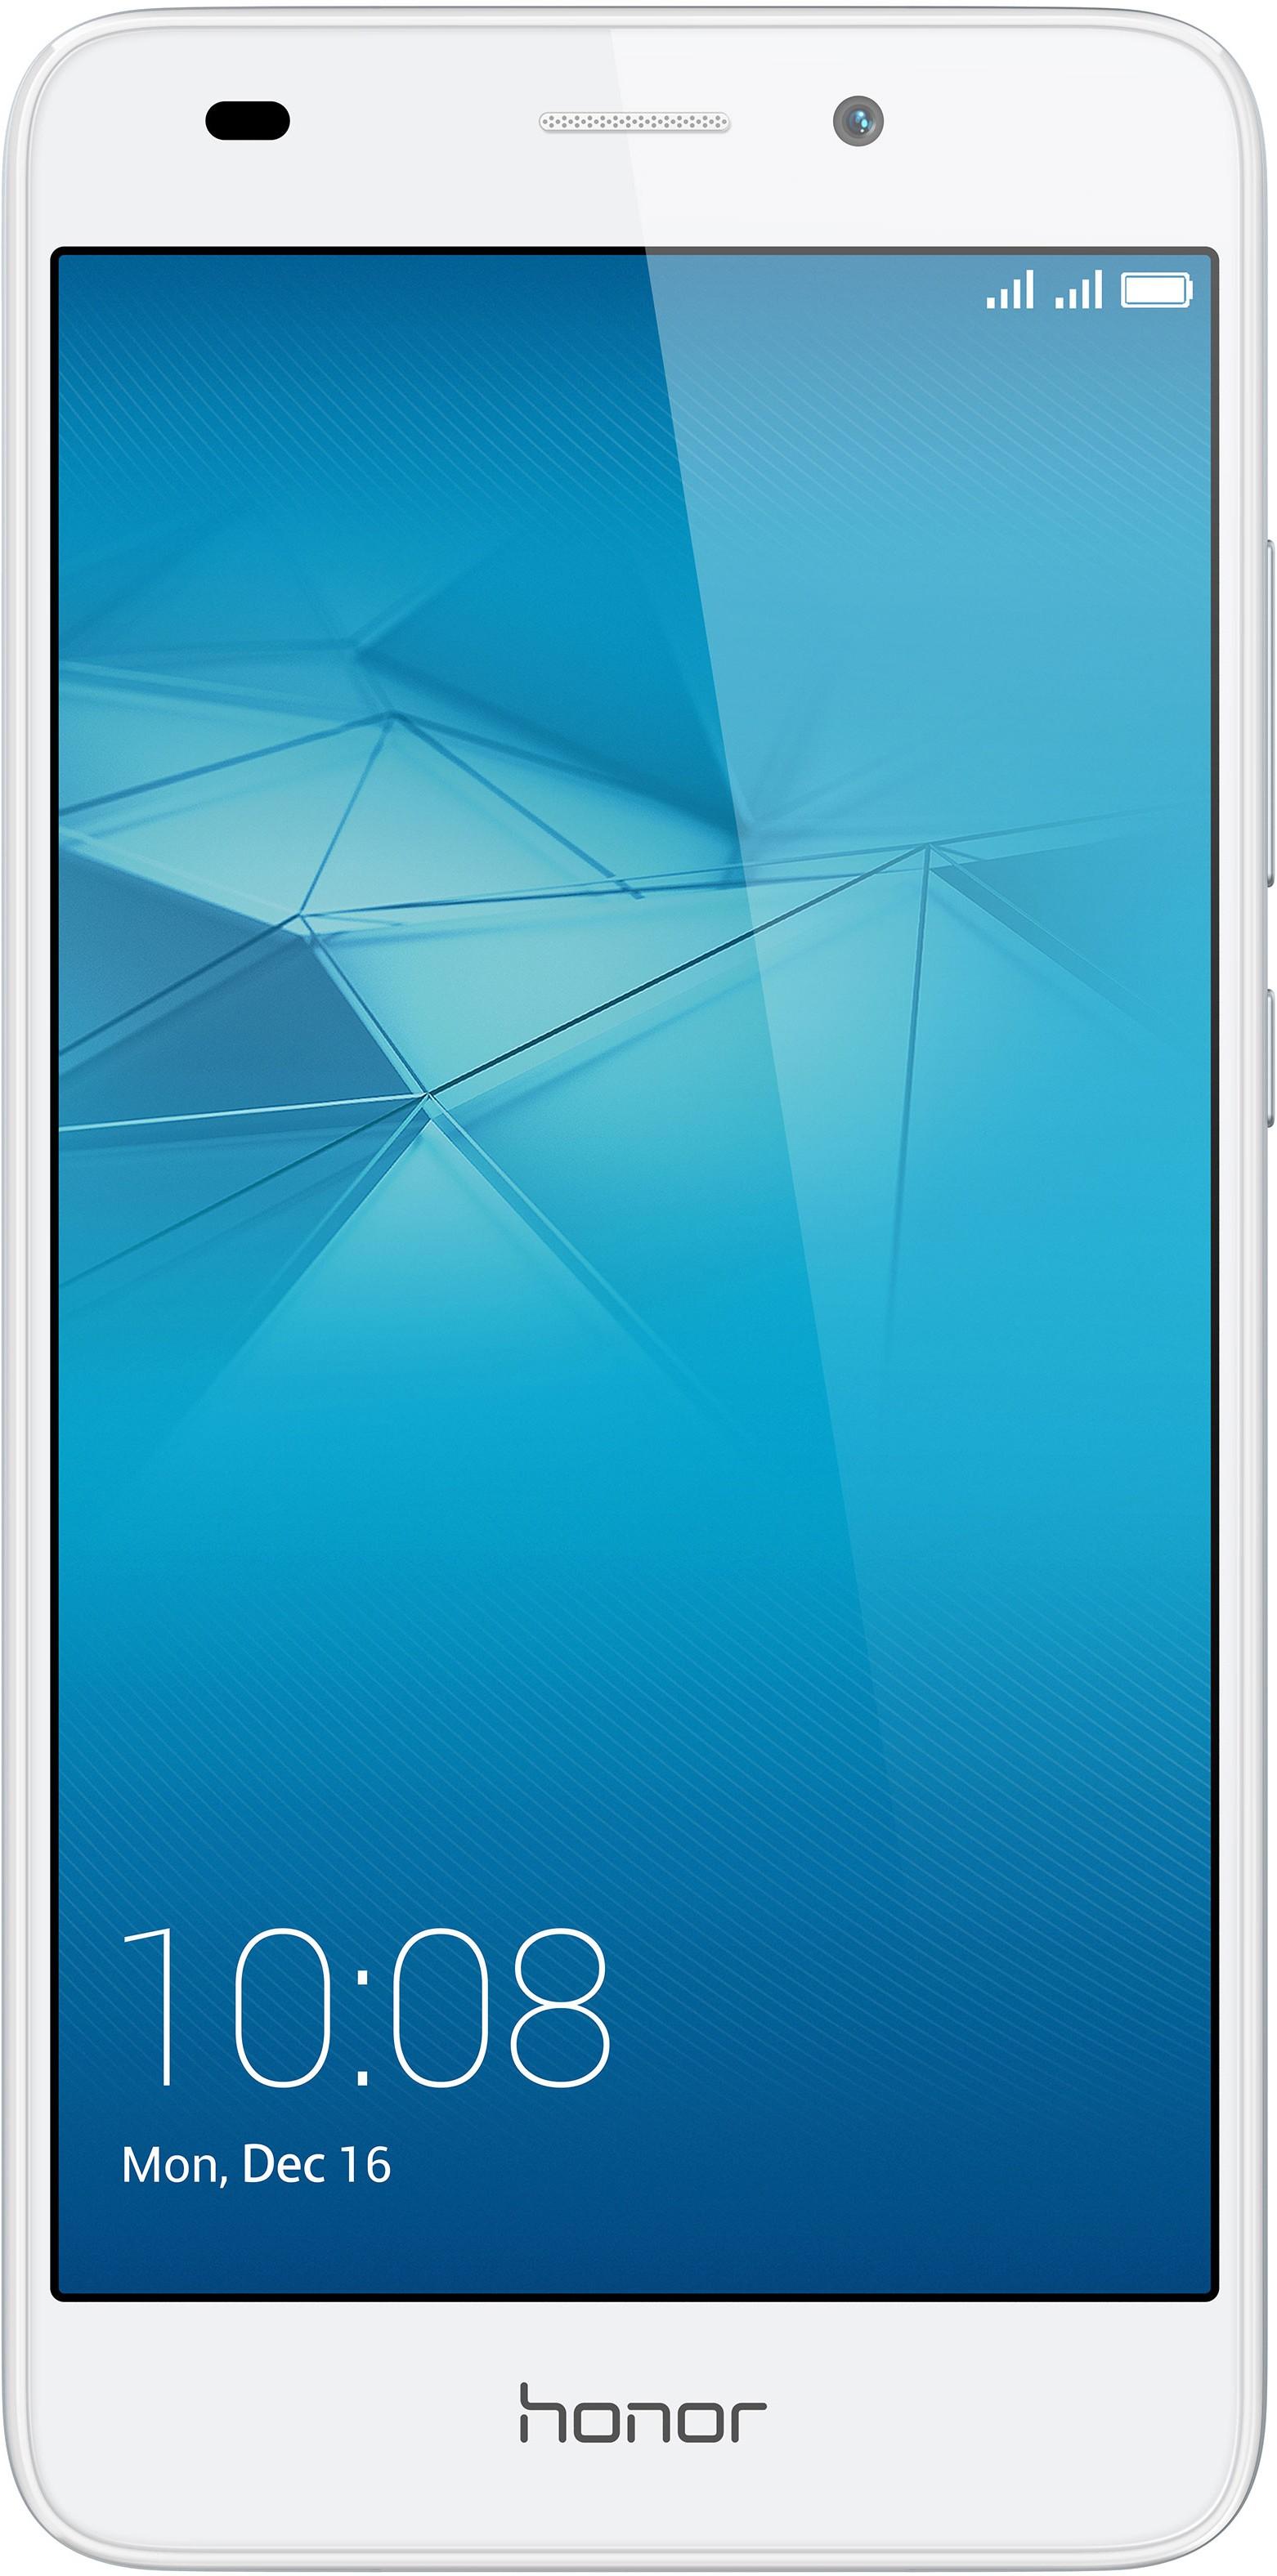 Huawei Honor 5C (2GB RAM, 16GB)